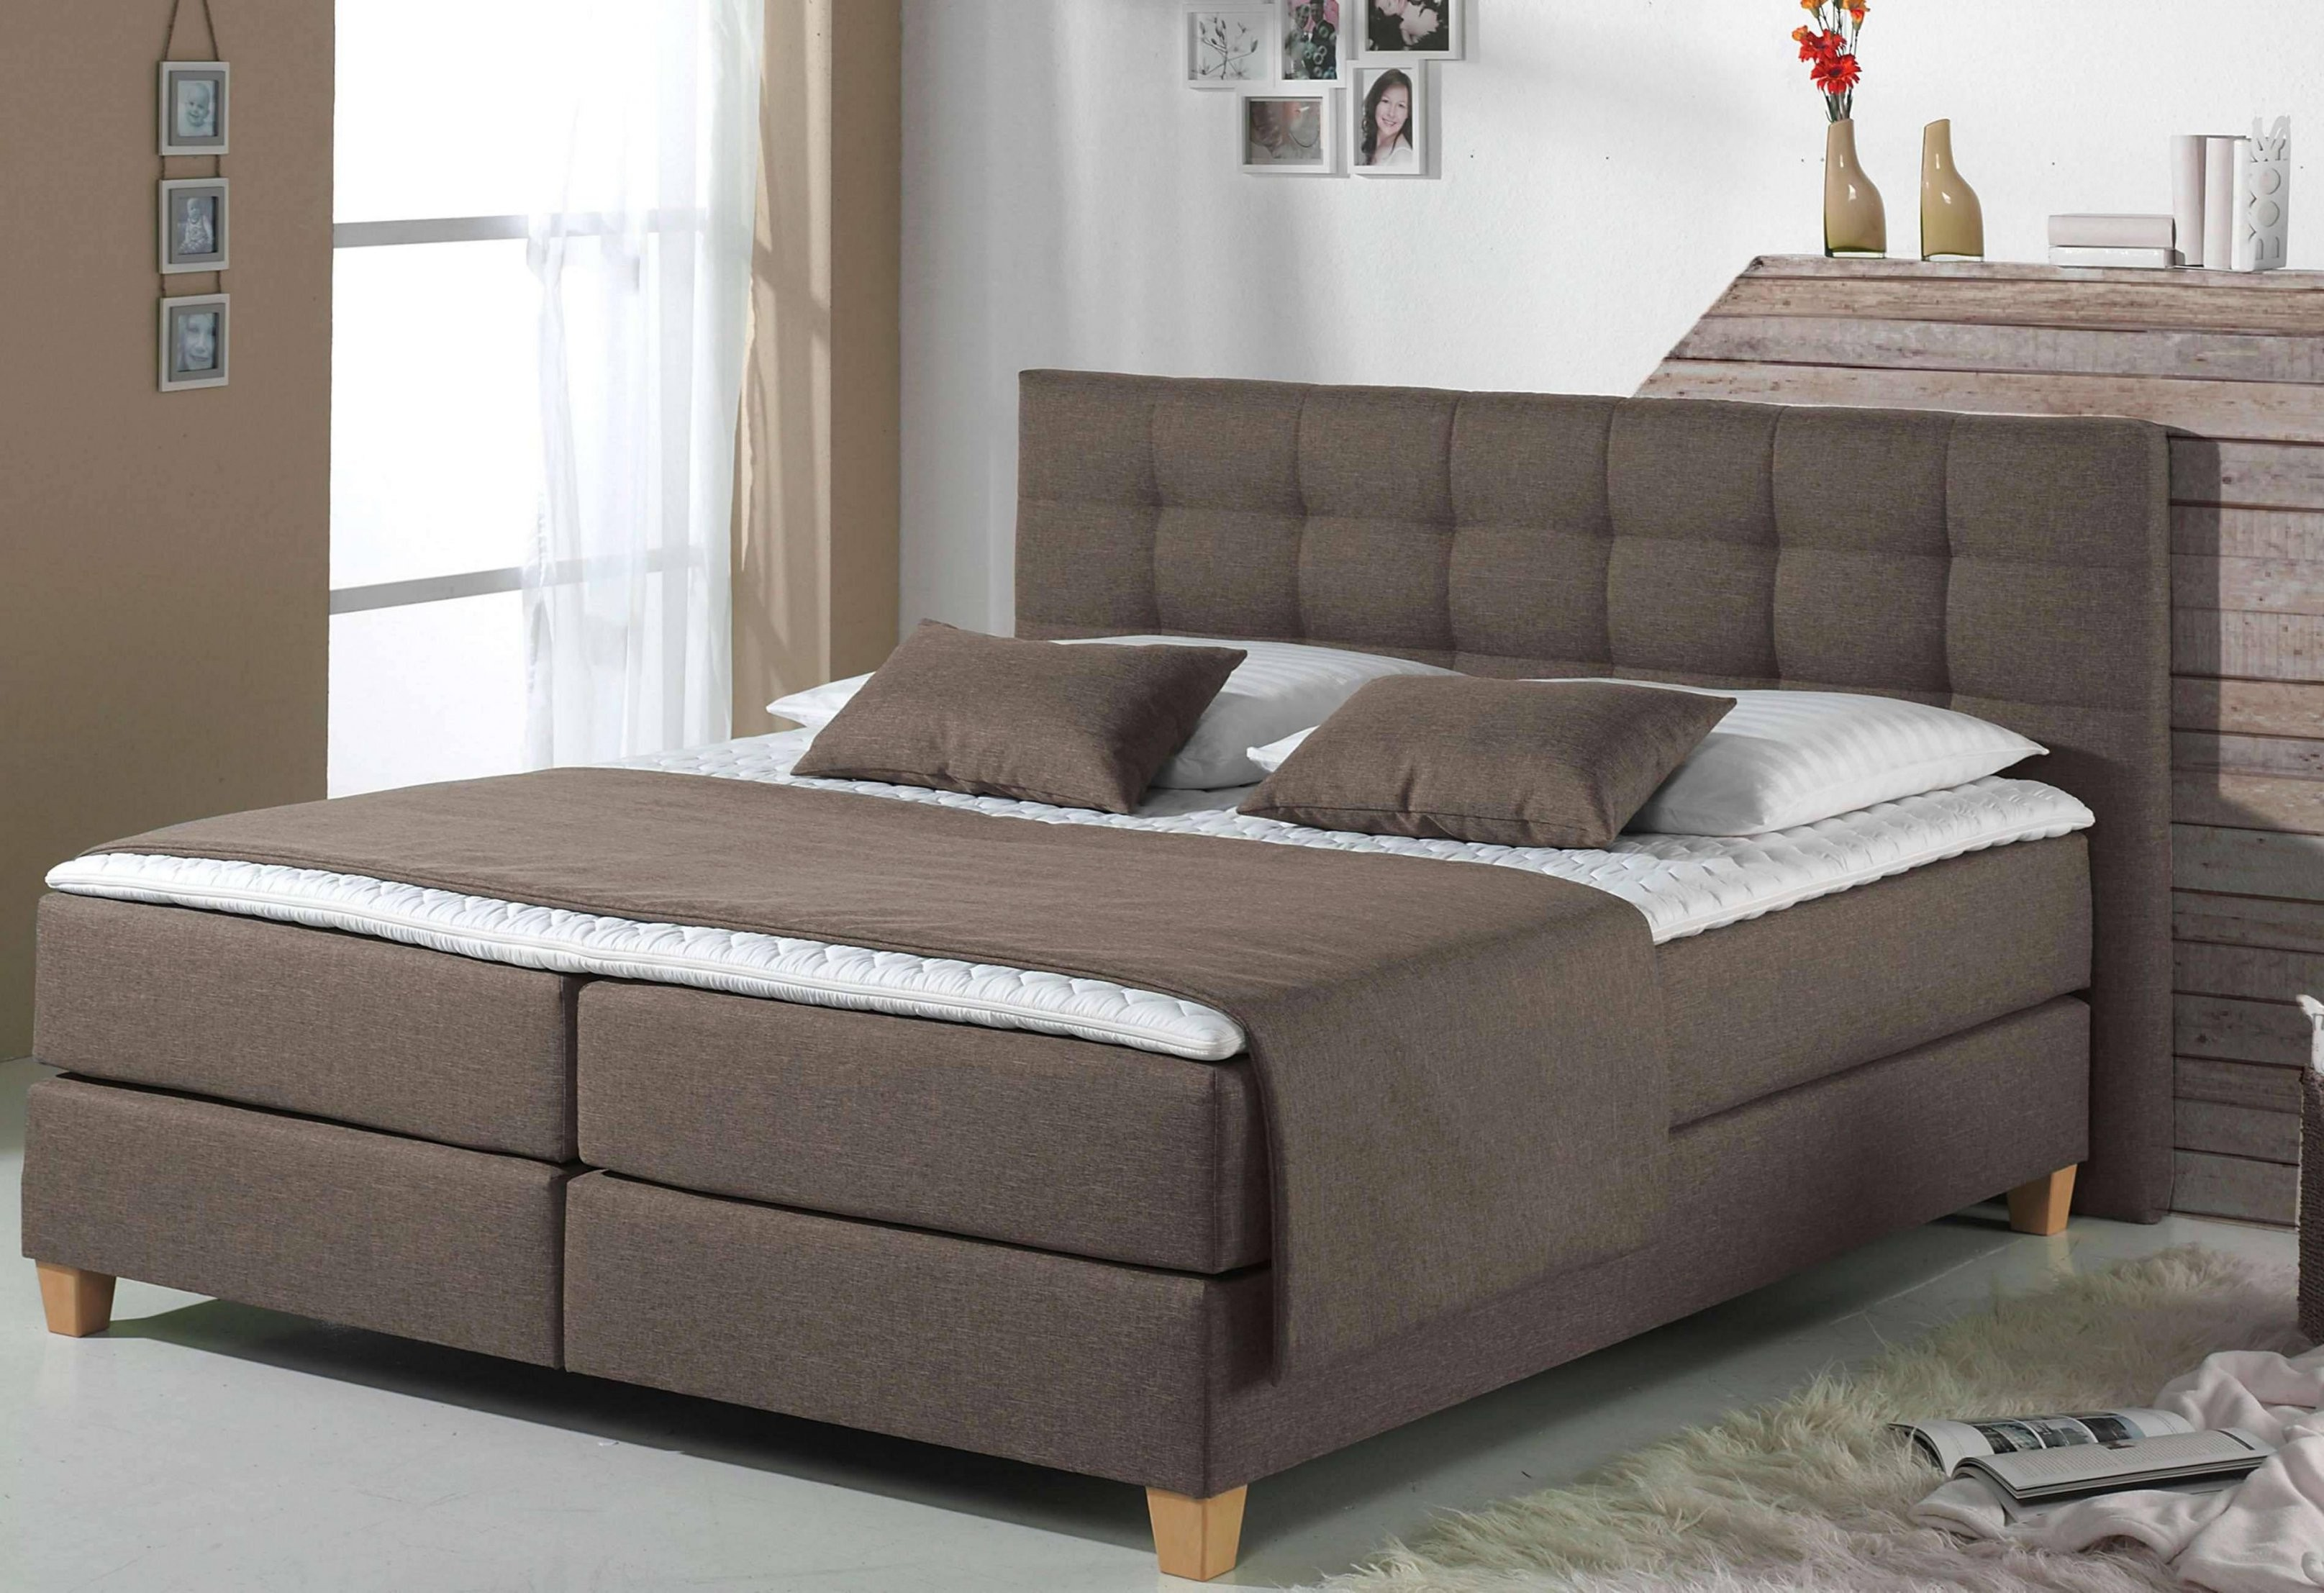 g nstige betten 160x200 haus bauen. Black Bedroom Furniture Sets. Home Design Ideas